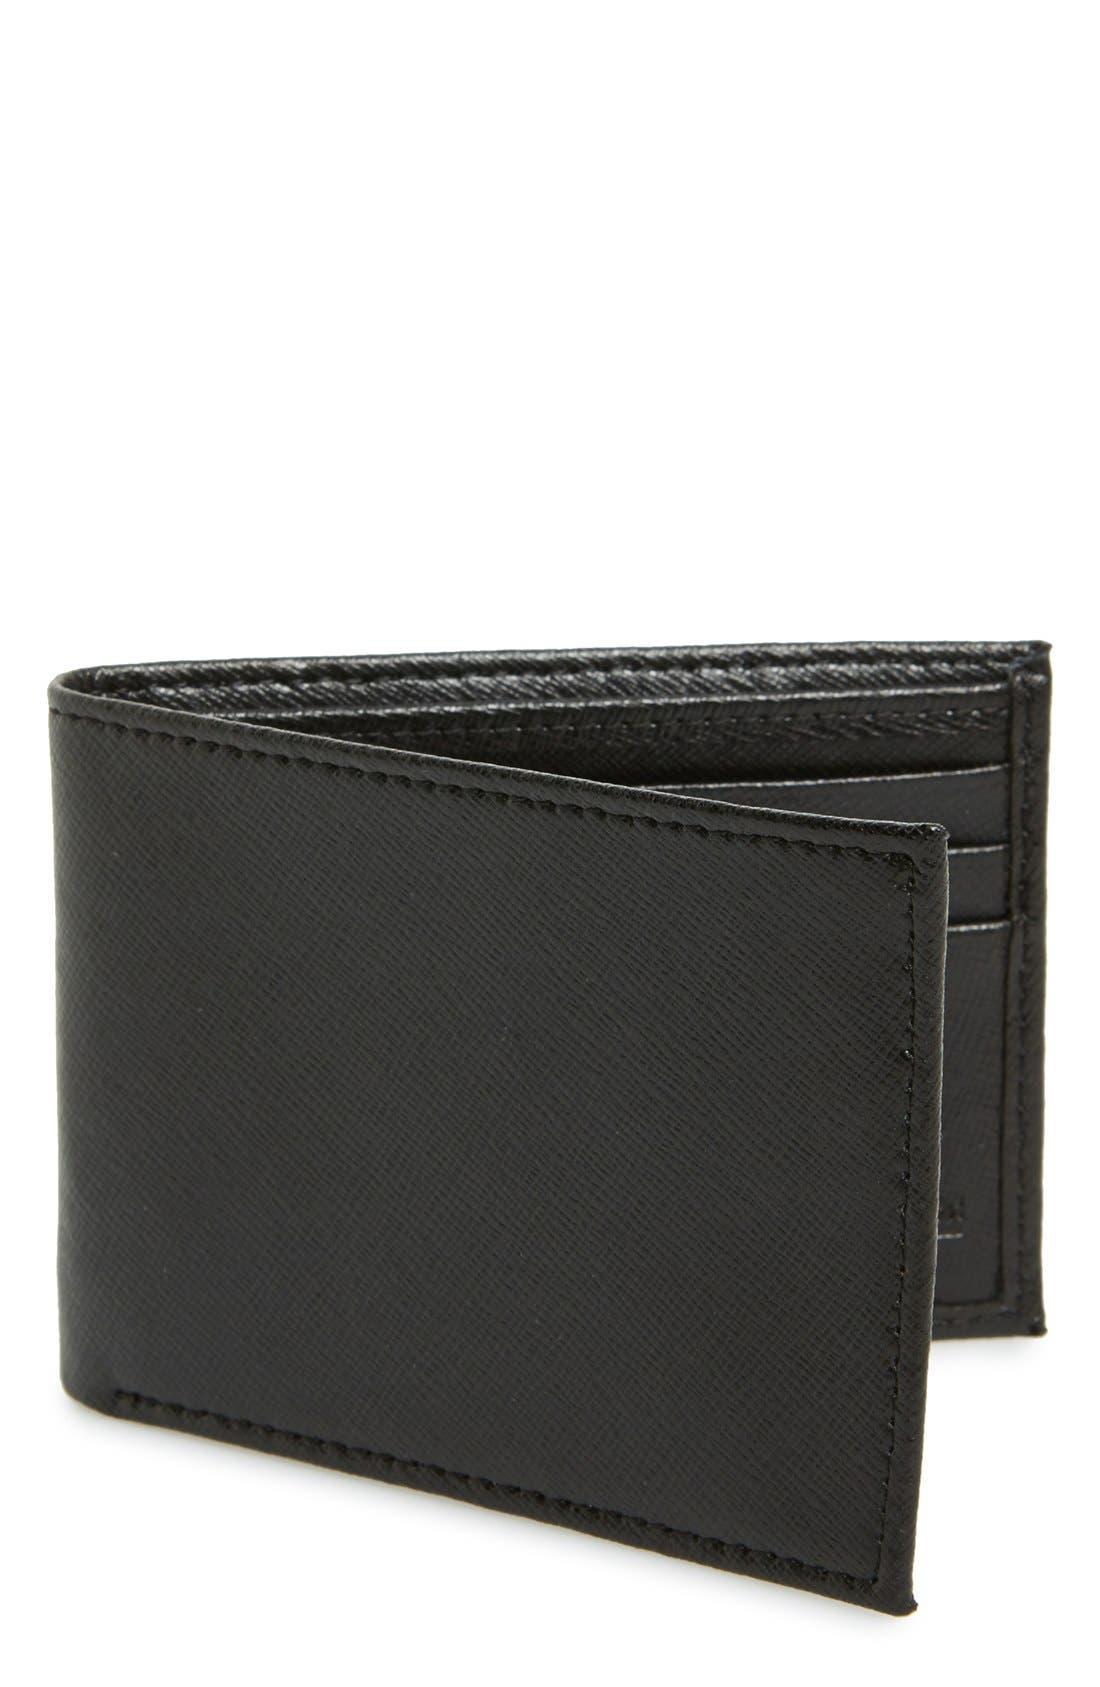 Alternate Image 1 Selected - Nordstrom Men's Shop Large Saffiano Leather Bifold Wallet